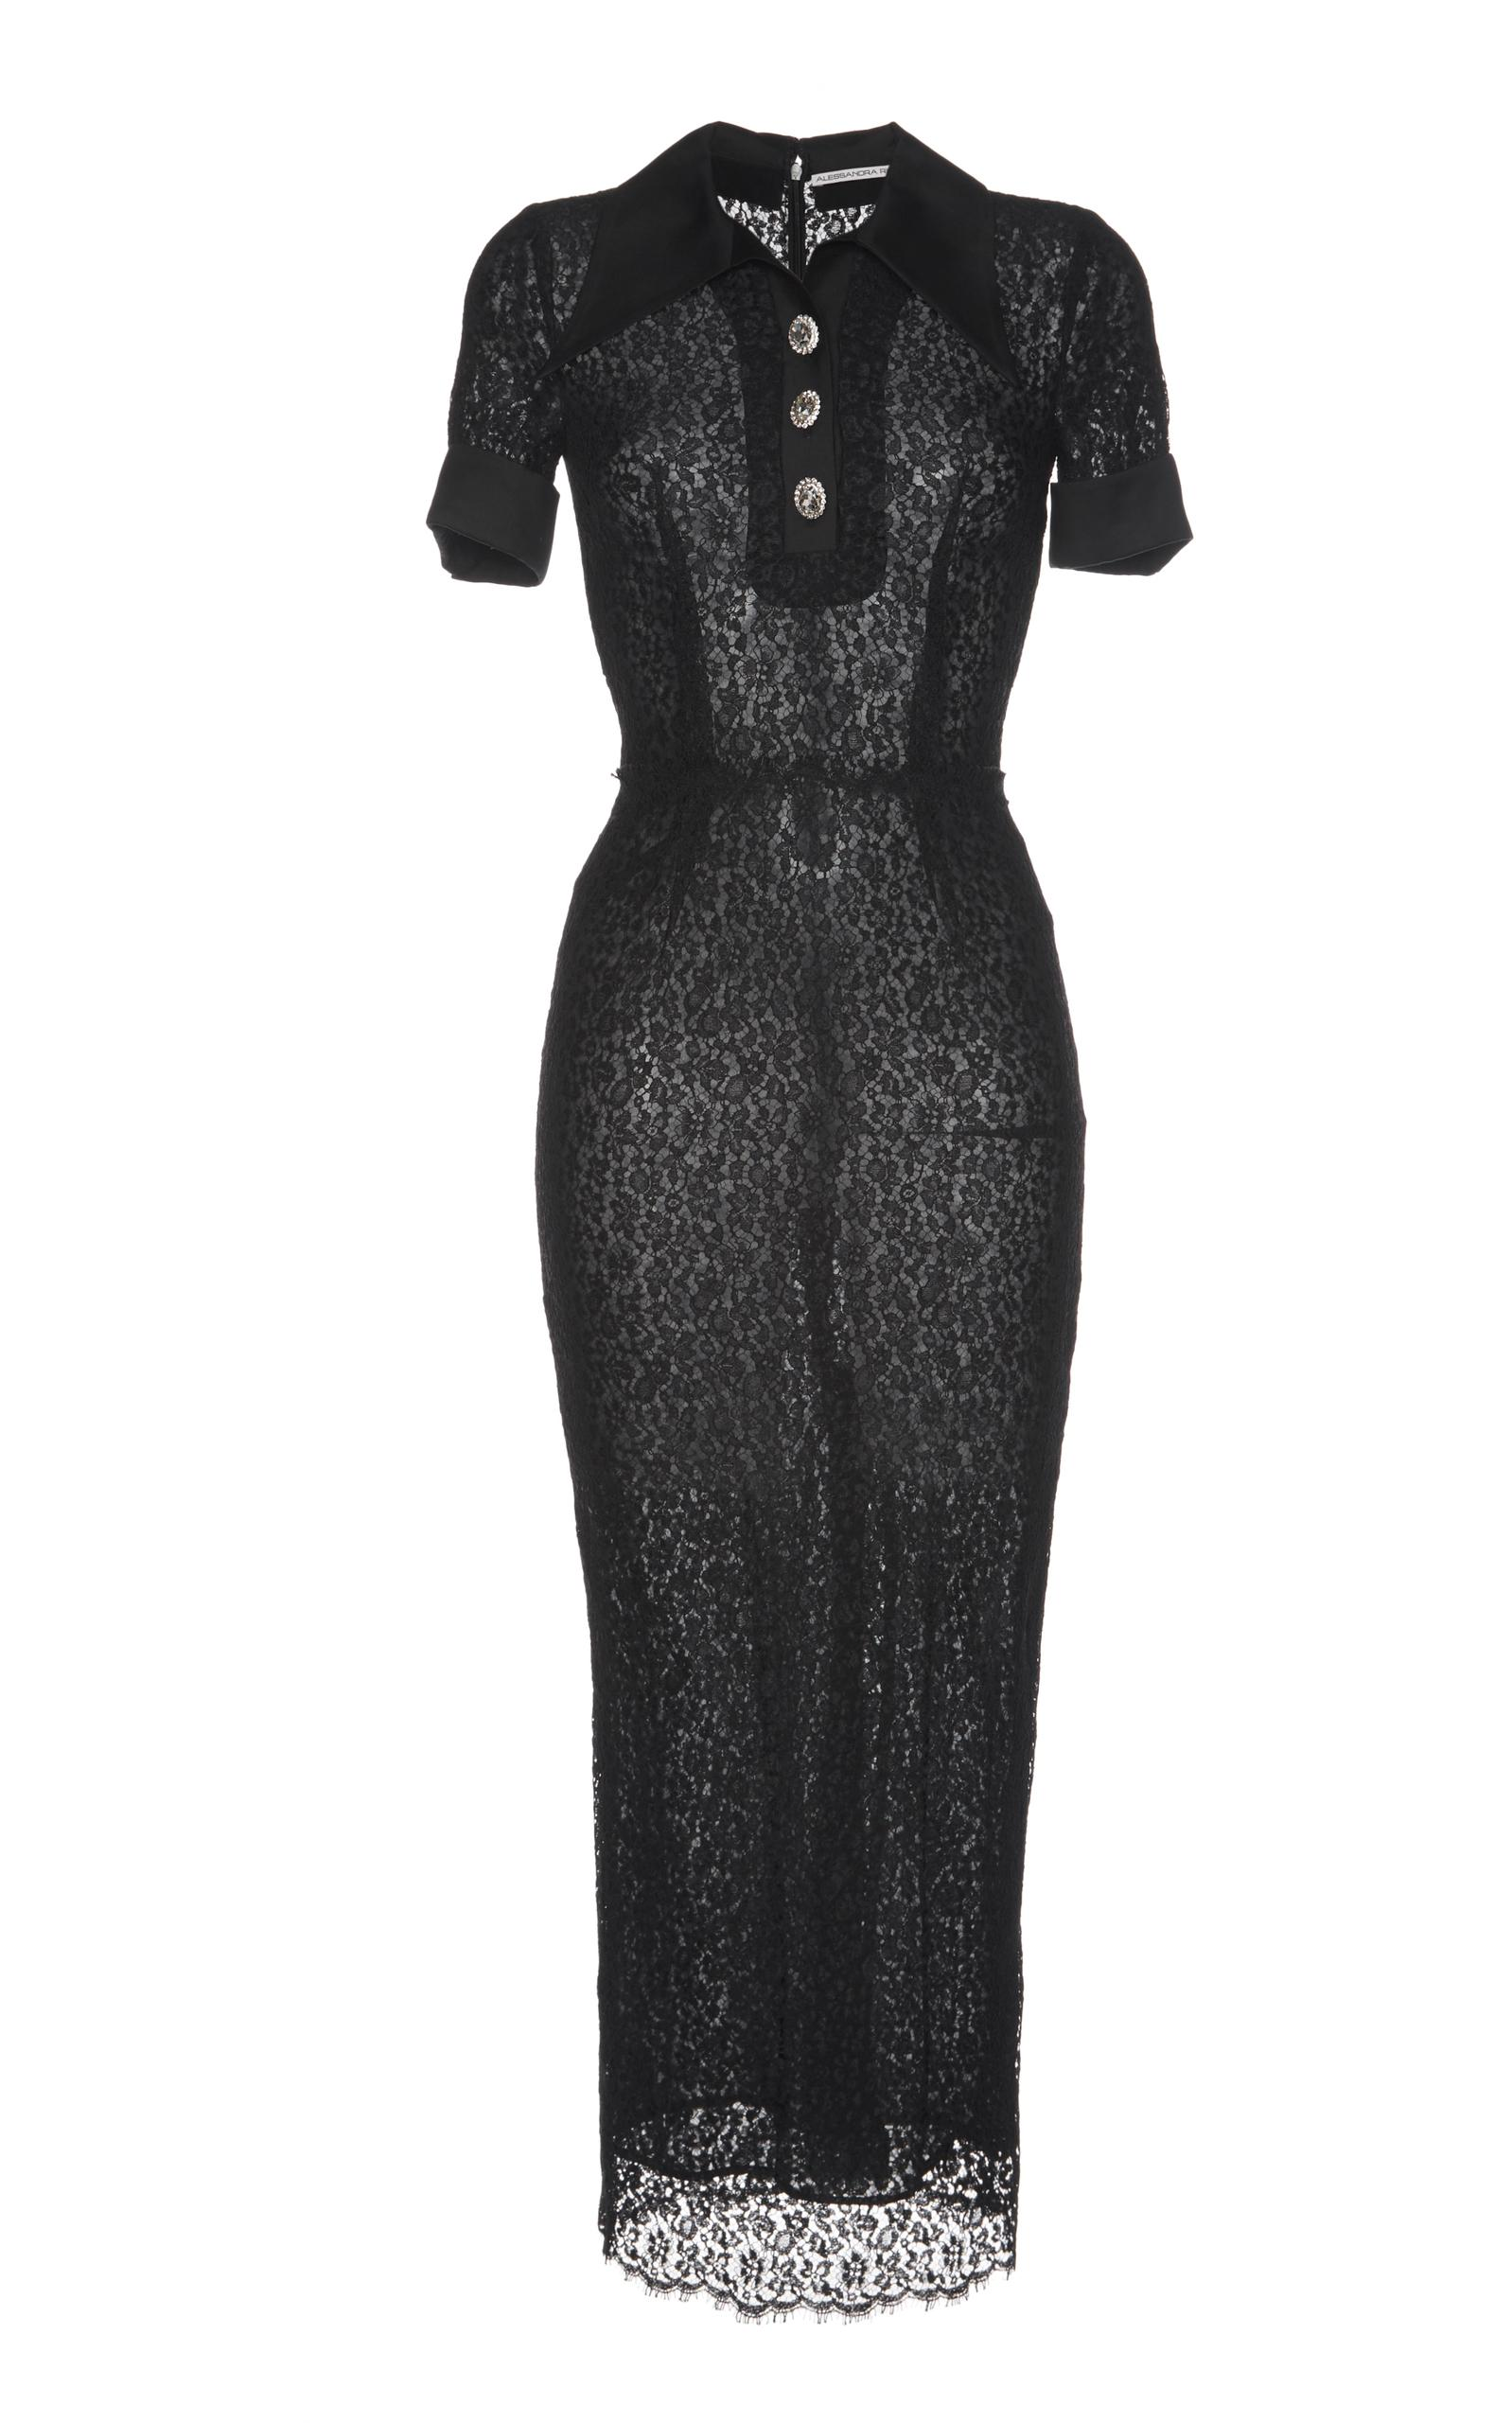 Alessandra Rich SablÉ Polo Dress In Black